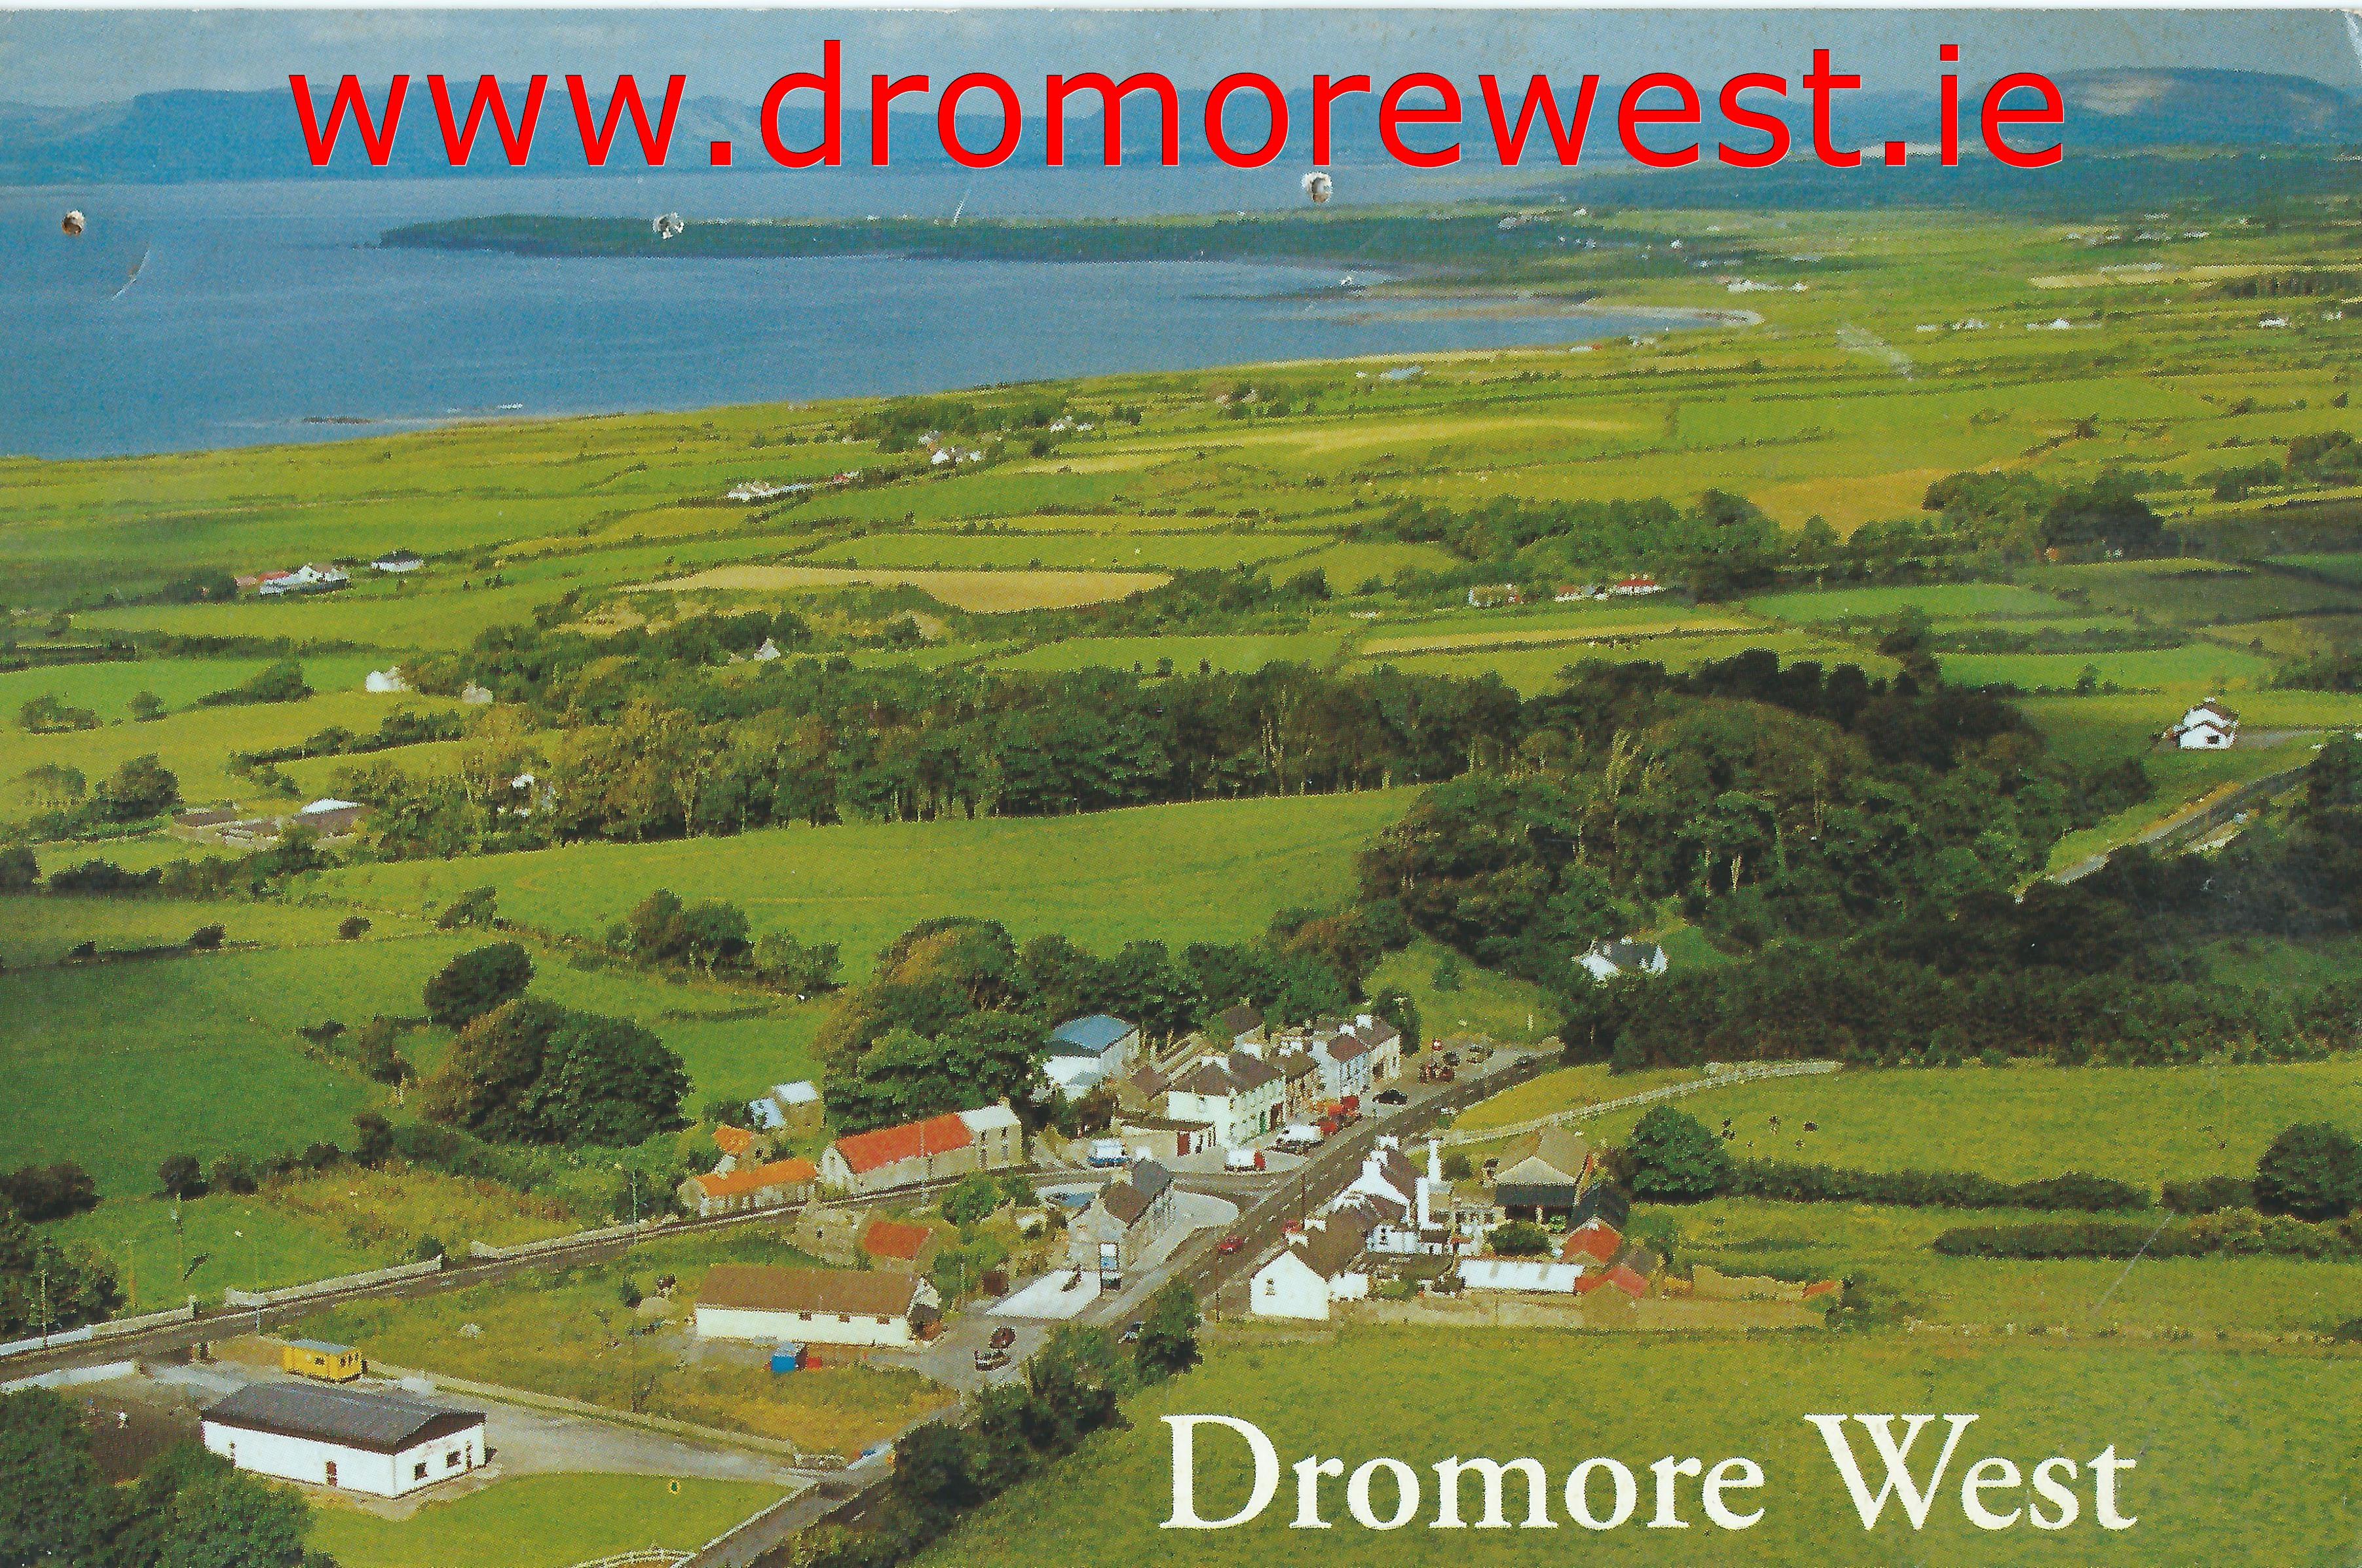 Dromore West Aerial